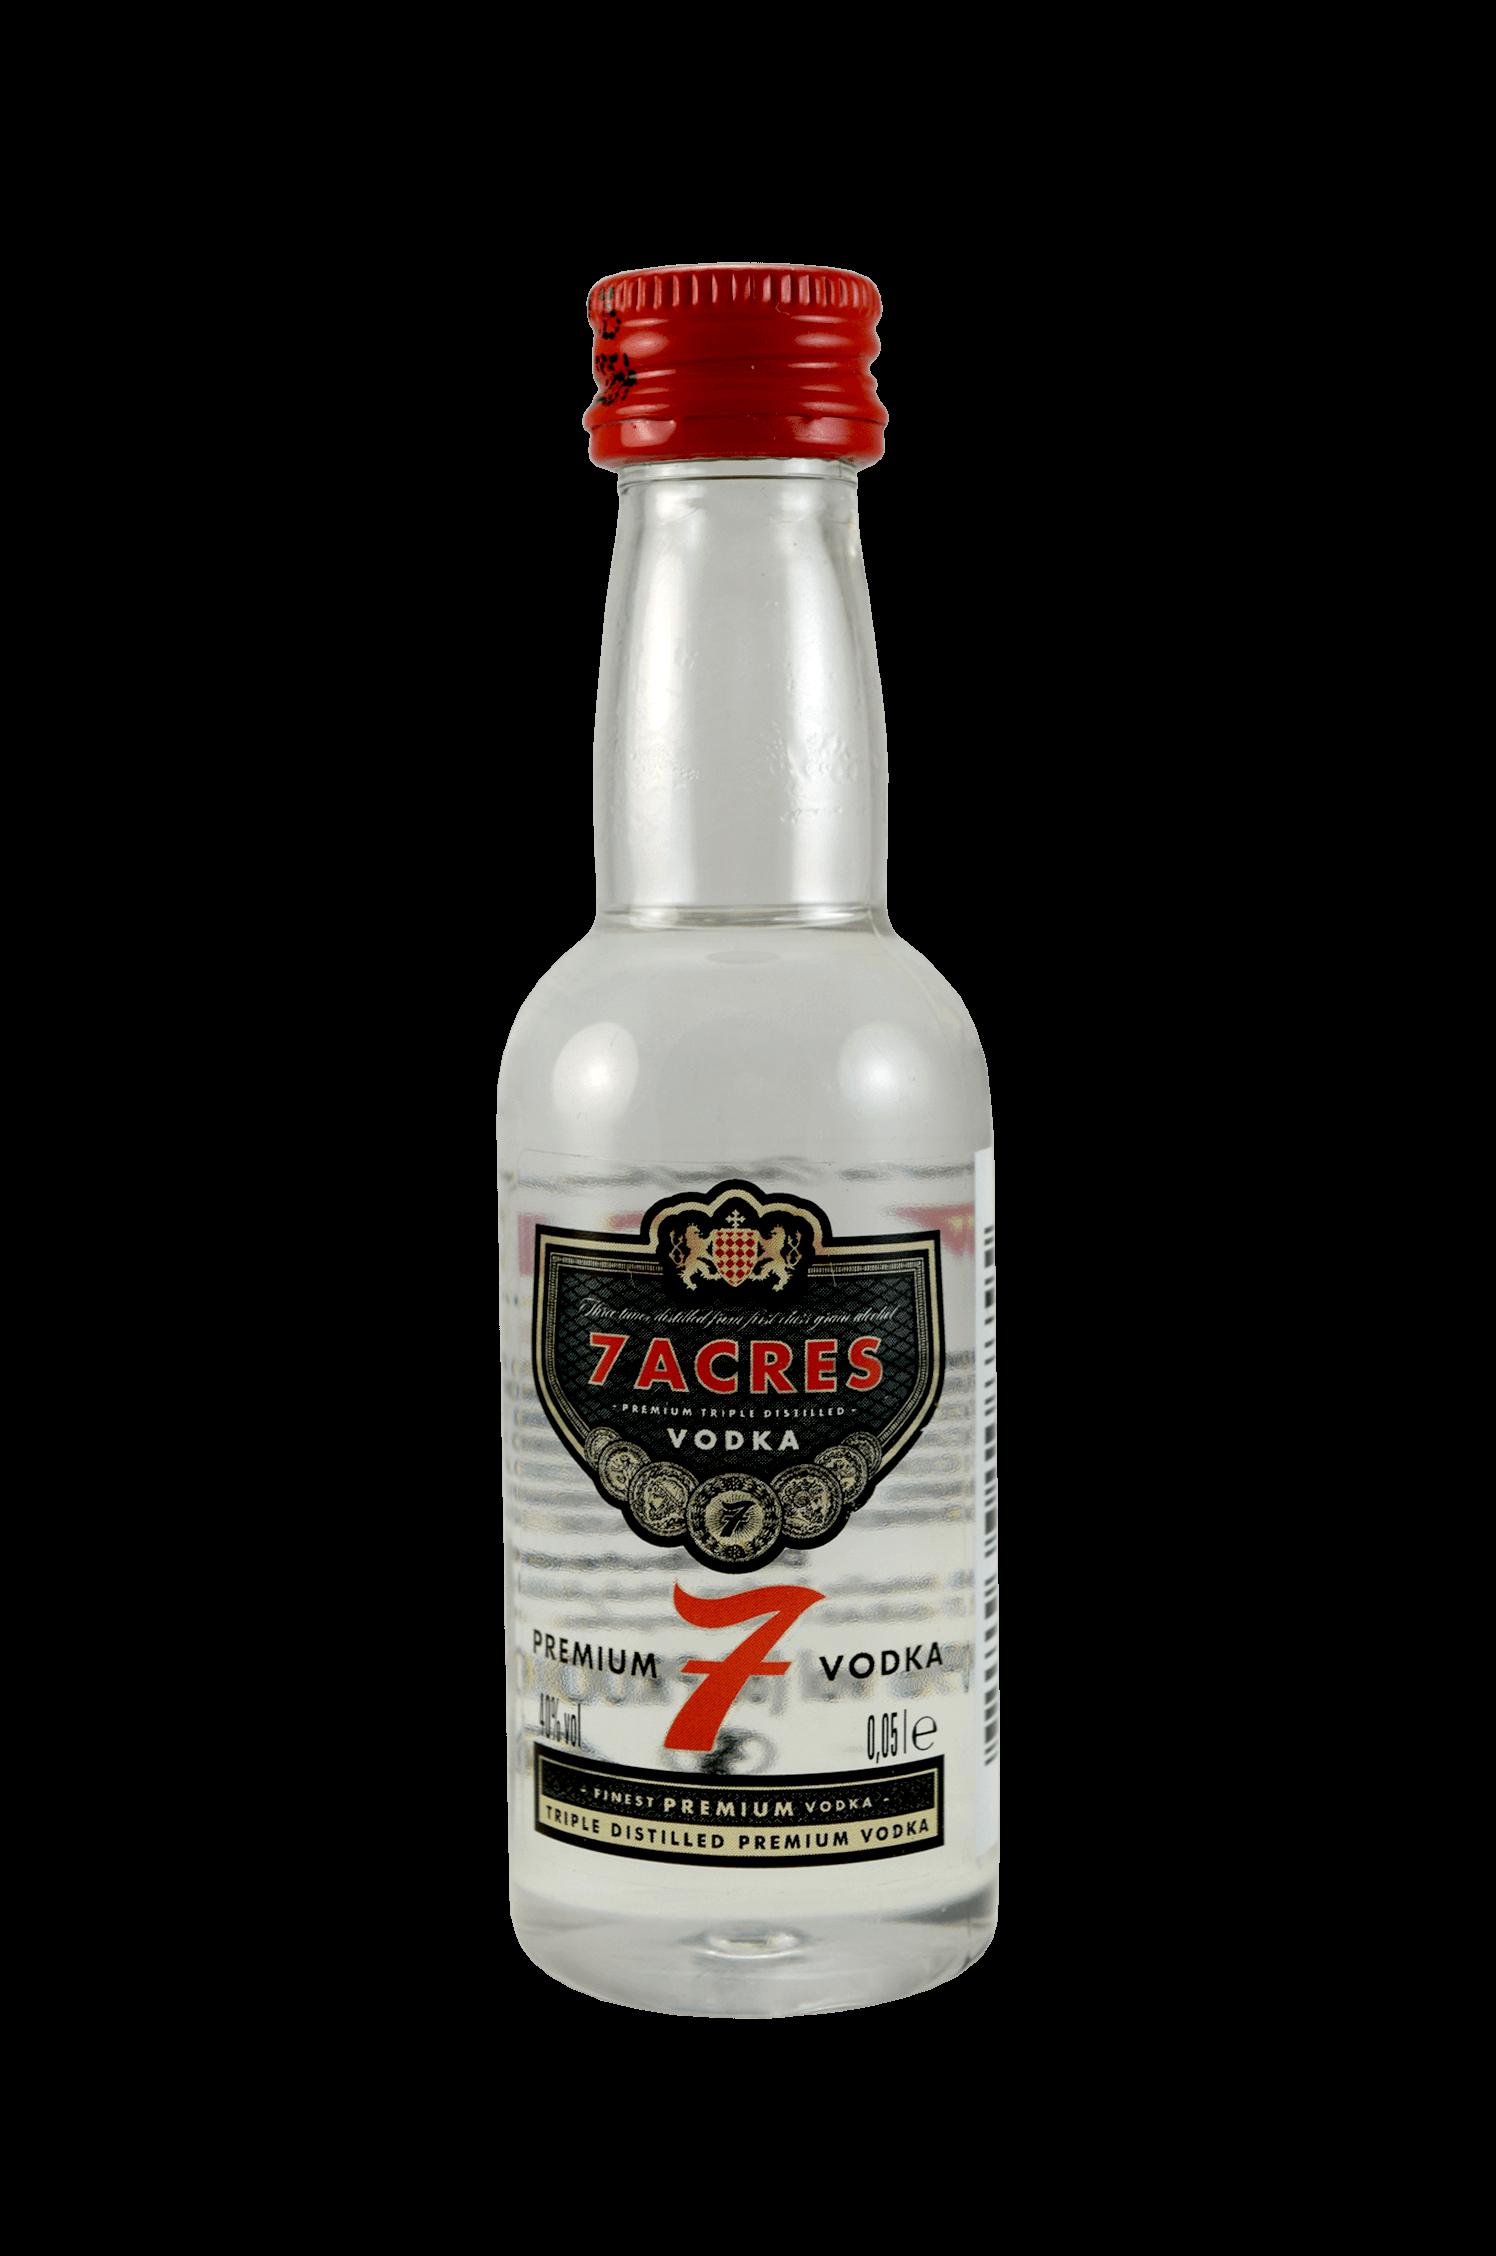 7acres Vodka